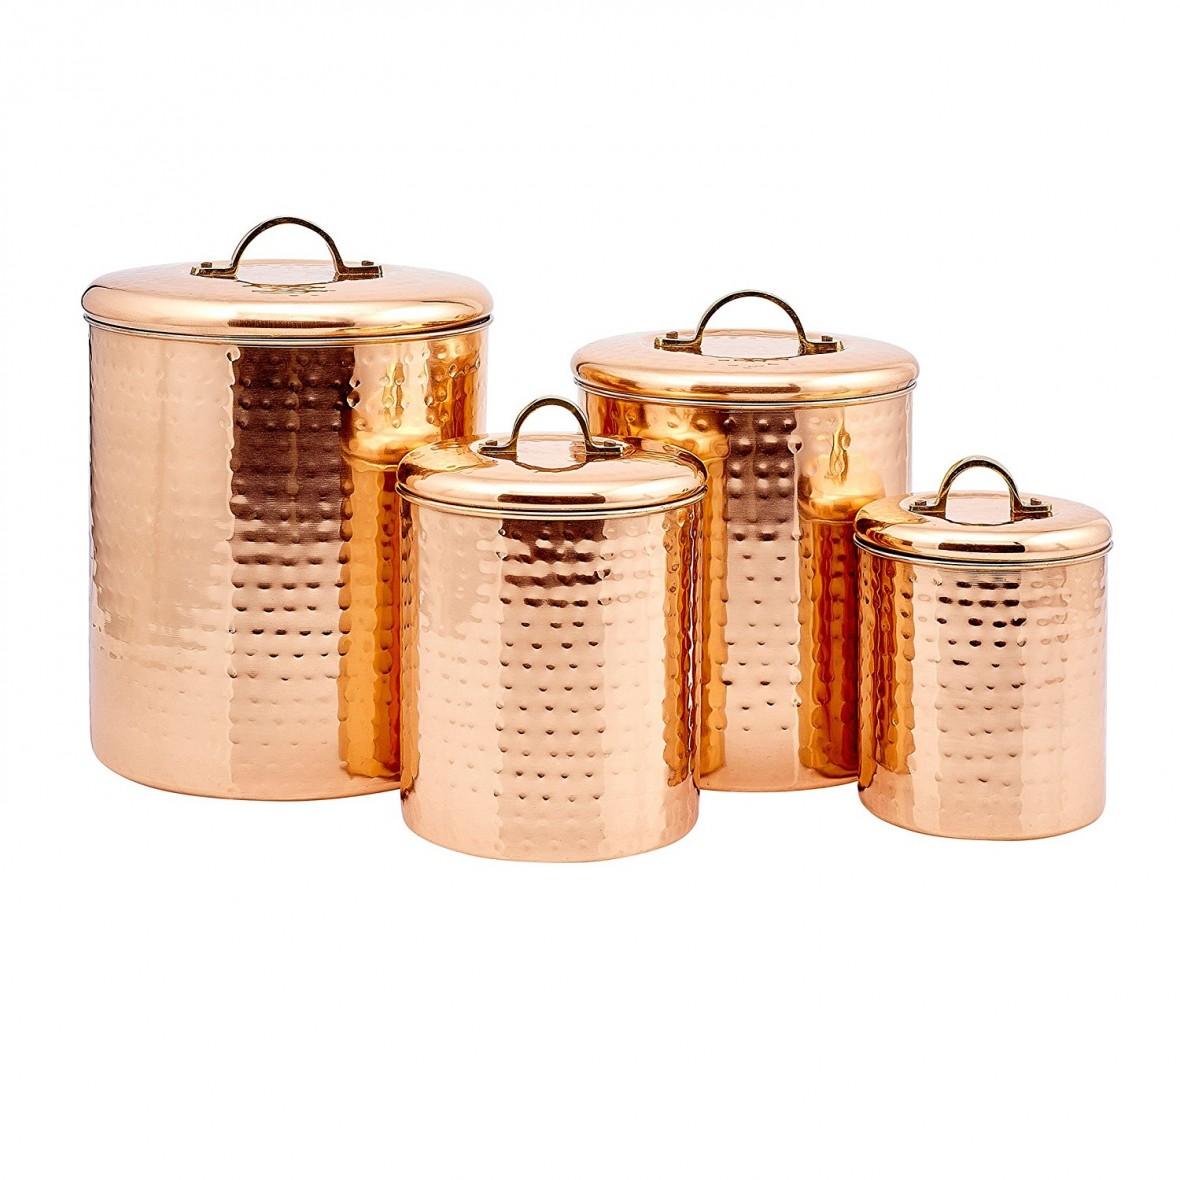 Hostess Gift Idea - Copper Canister Set